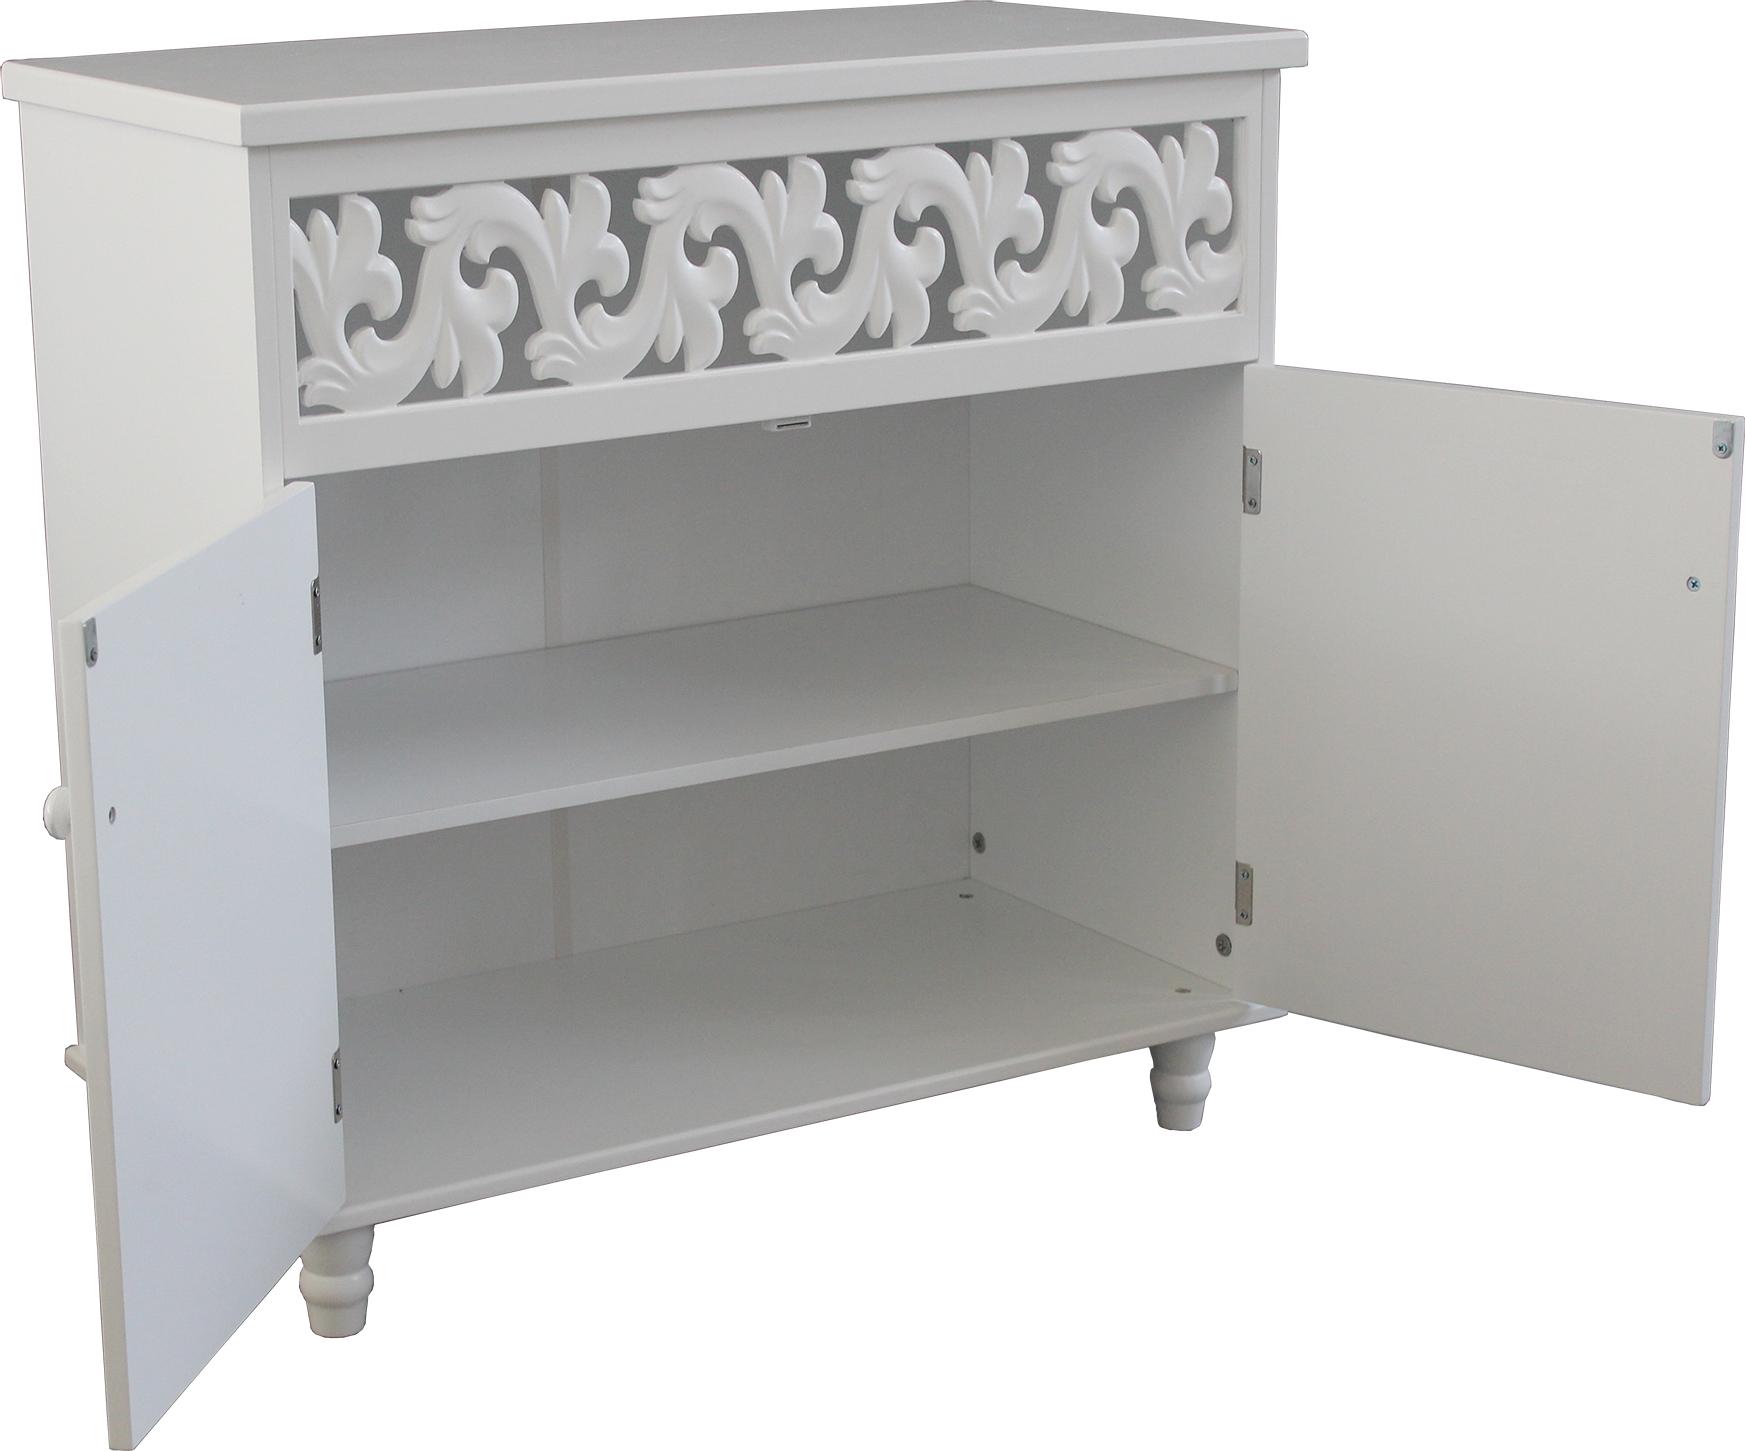 cupboard cabinet sideboard white wooden 2 doors furniture freestanding